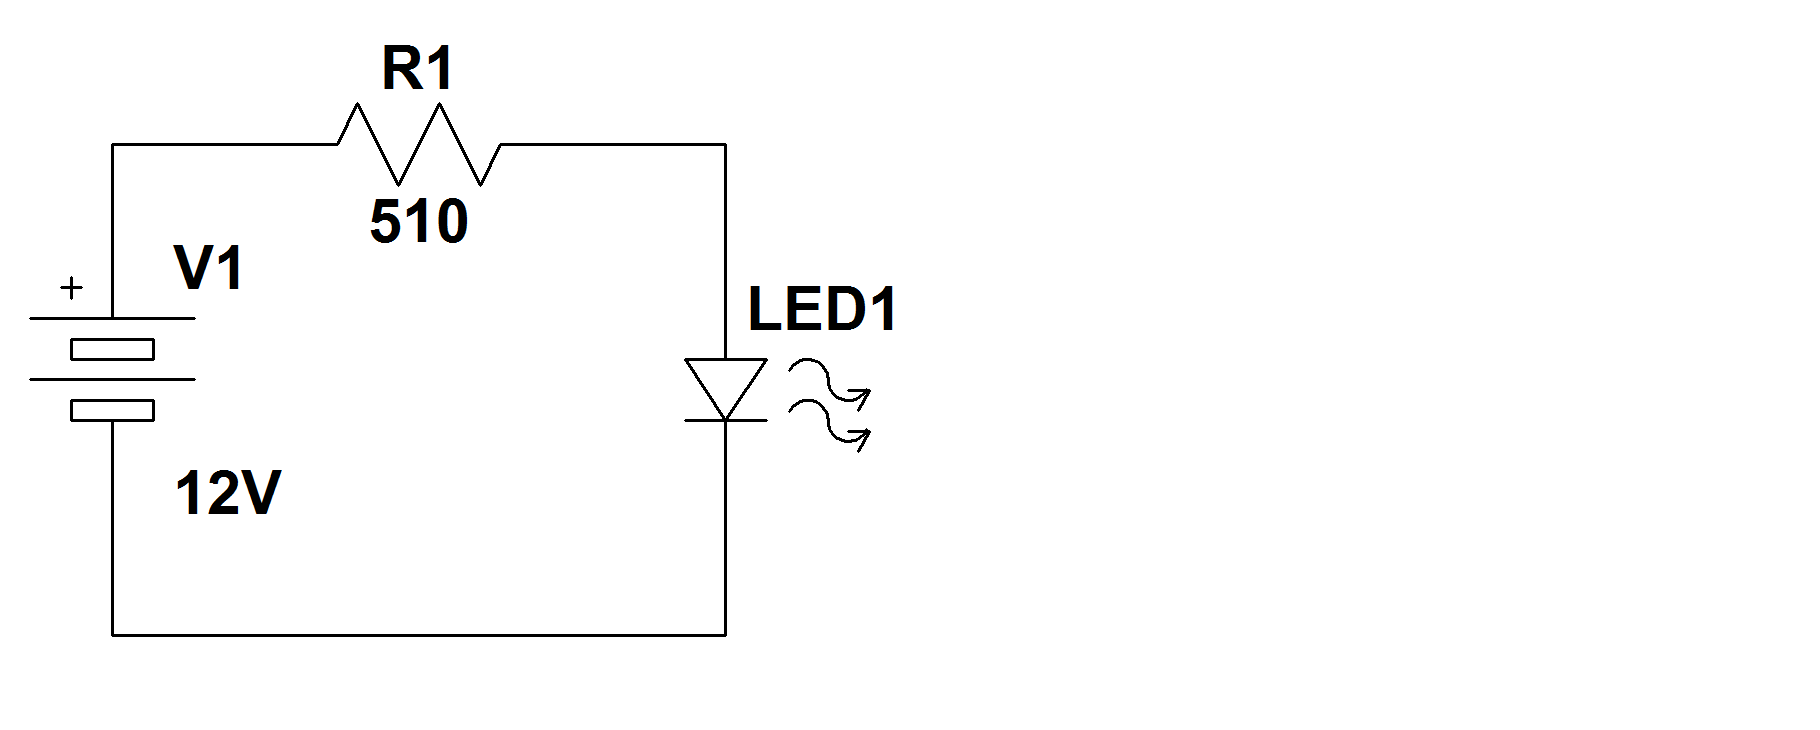 hight resolution of 3v 12v led wiring wiring diagram subcon 12v led wiring diagram 3v 12v led wiring